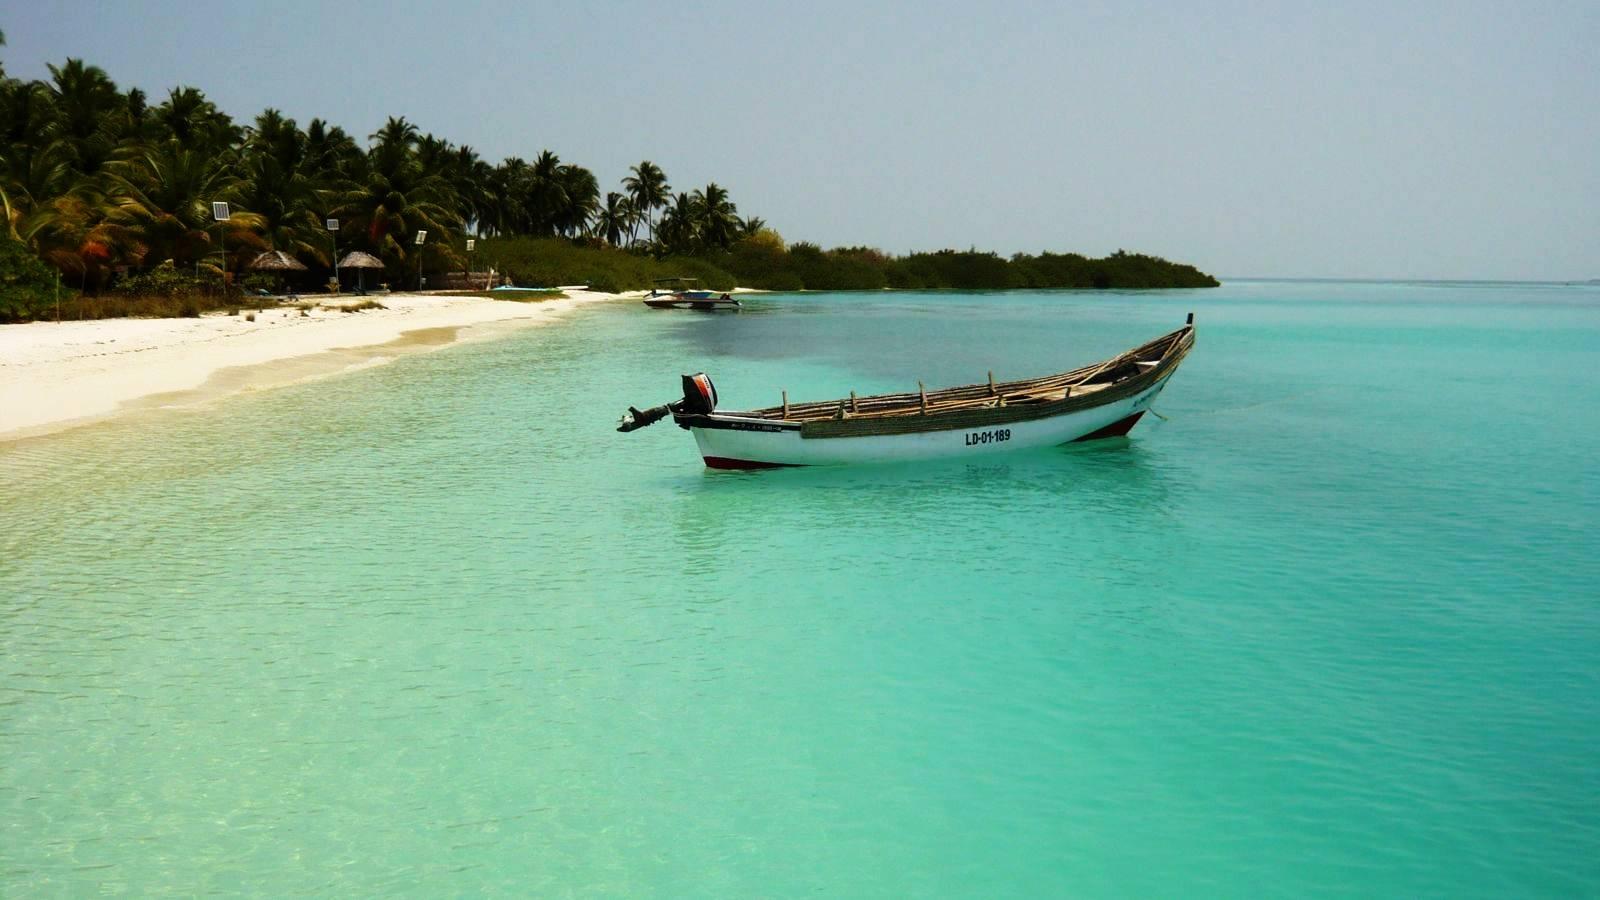 Bangaram-Beach-in-Lakshadweep-Islands.jpg